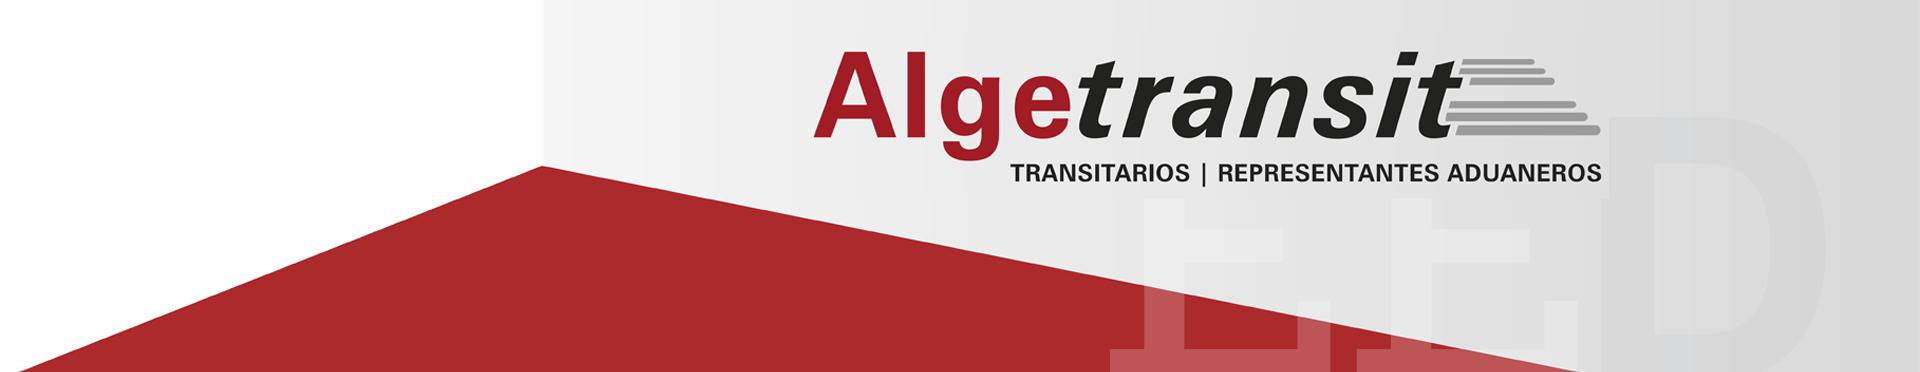 EED_-Algetransit_cabecera